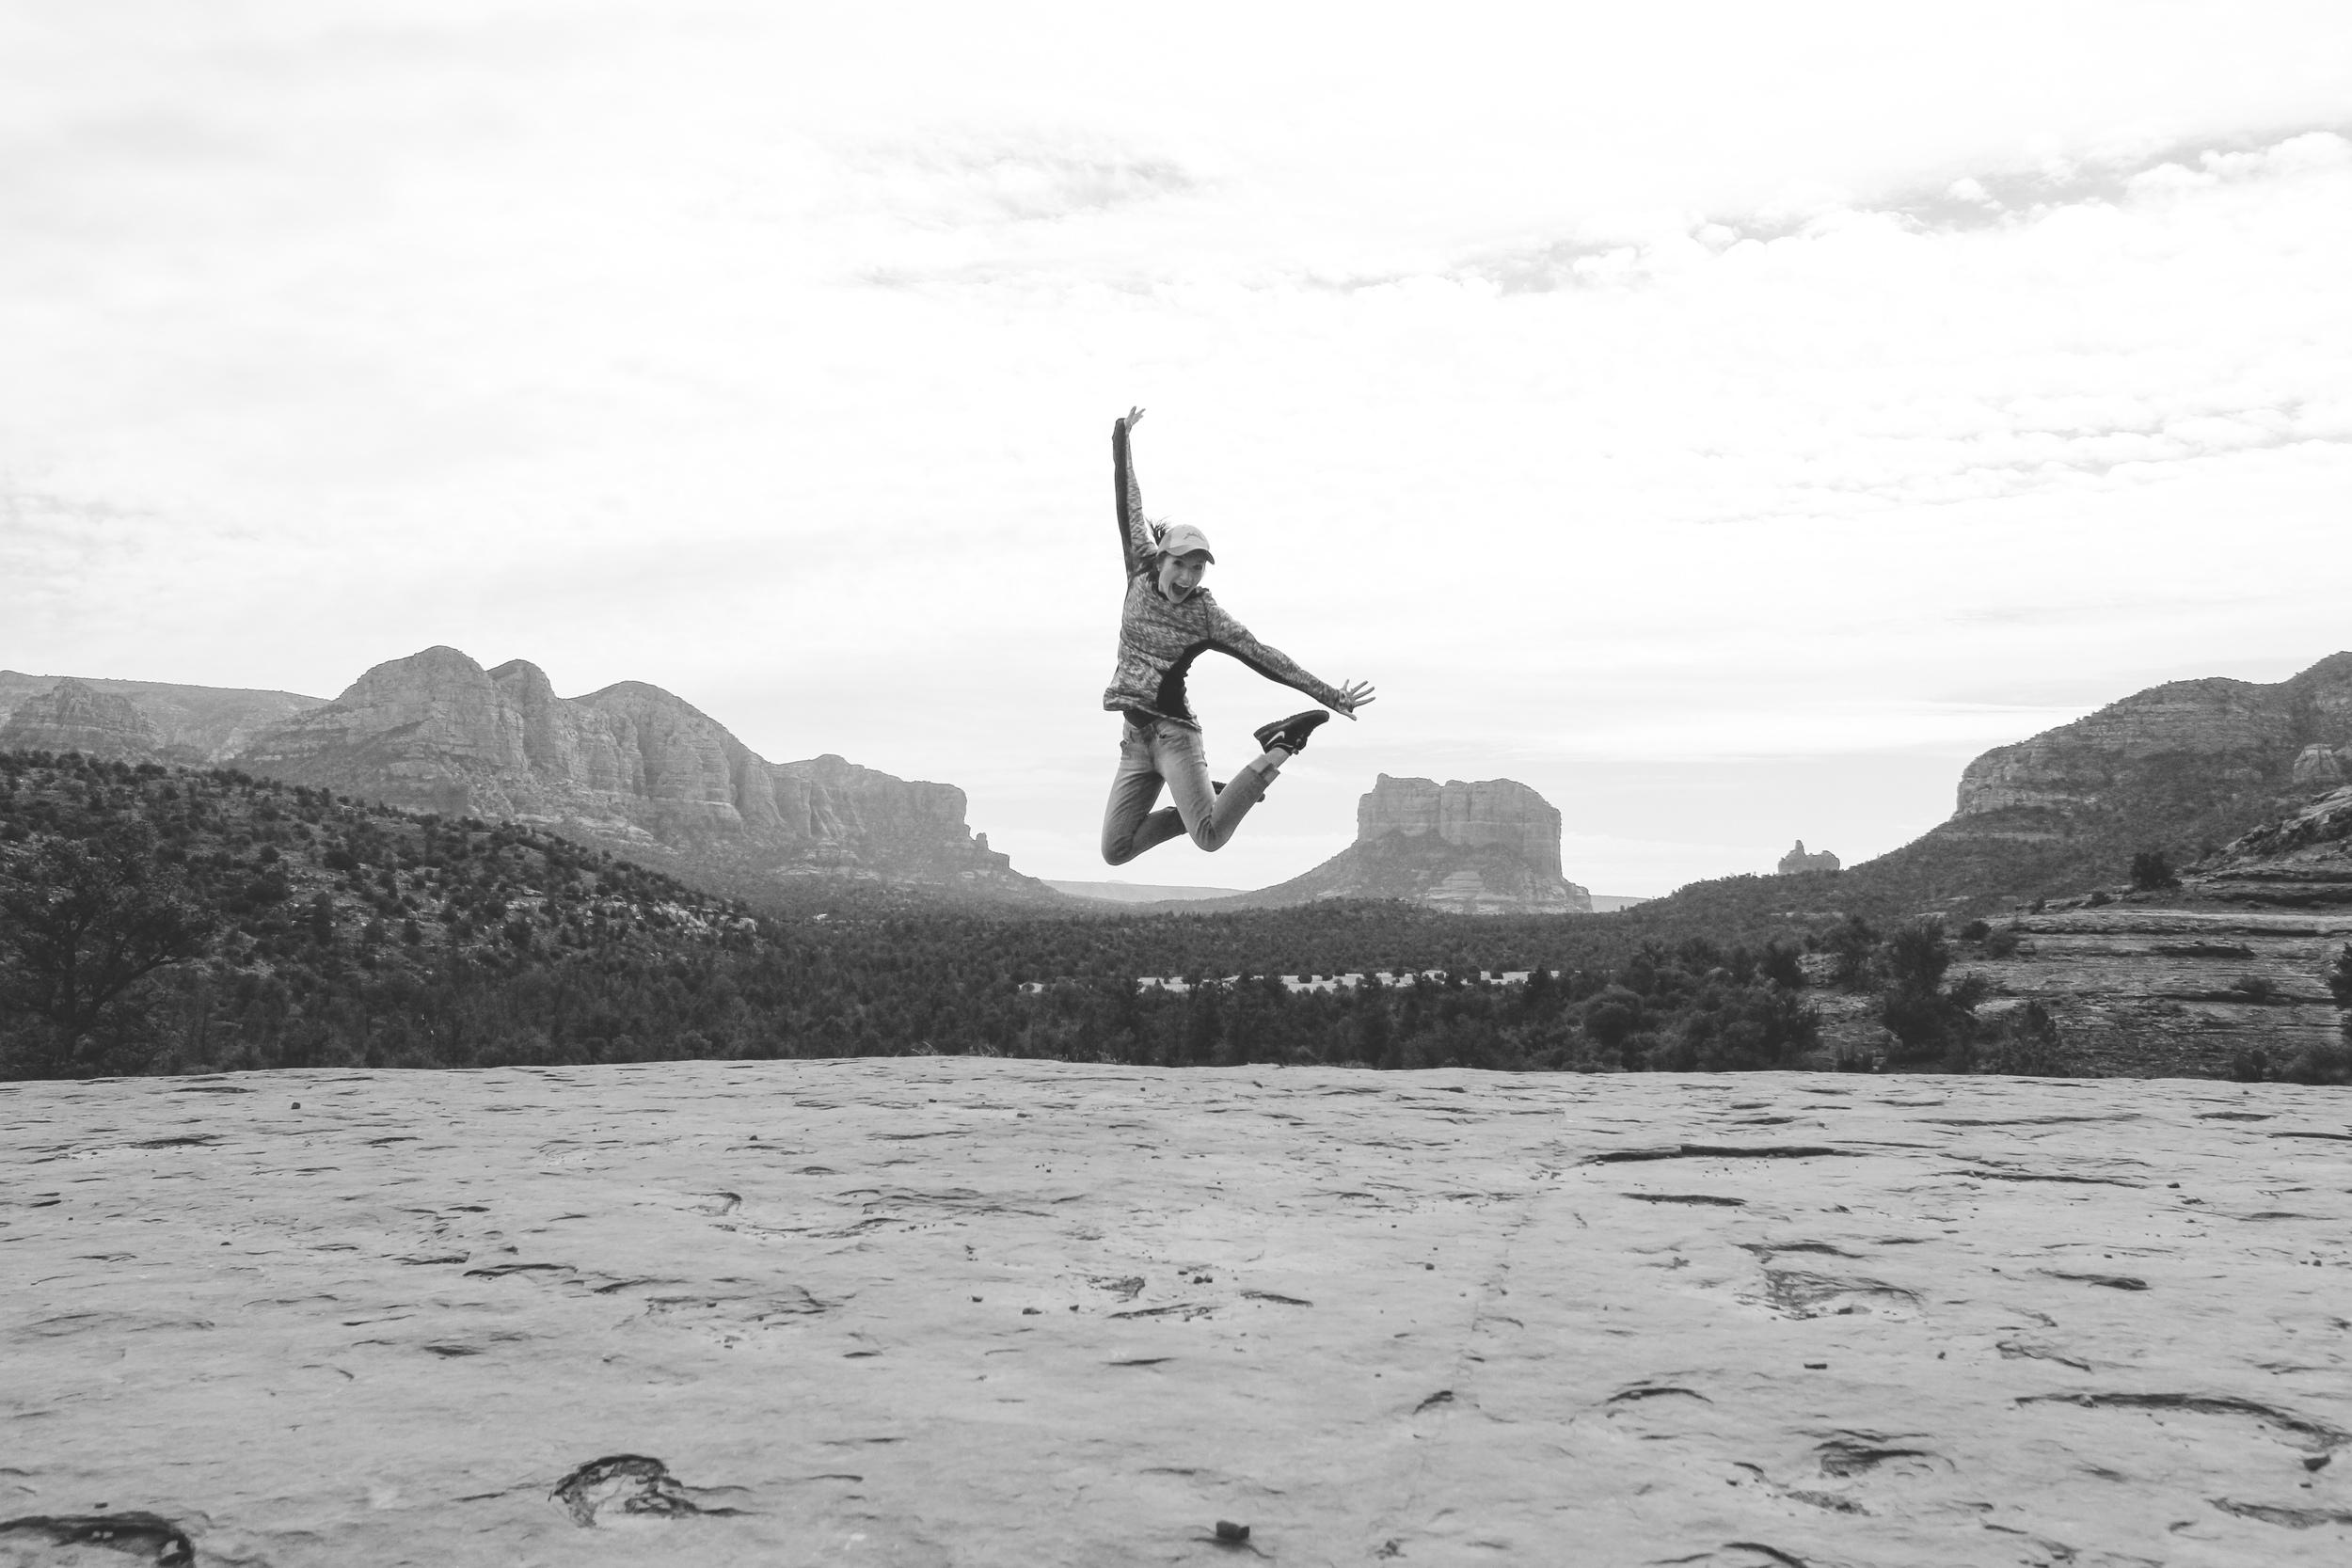 Honeymoon_Tuesday_Sedona_Arizona_JonCourvillePhotography-11.jpg